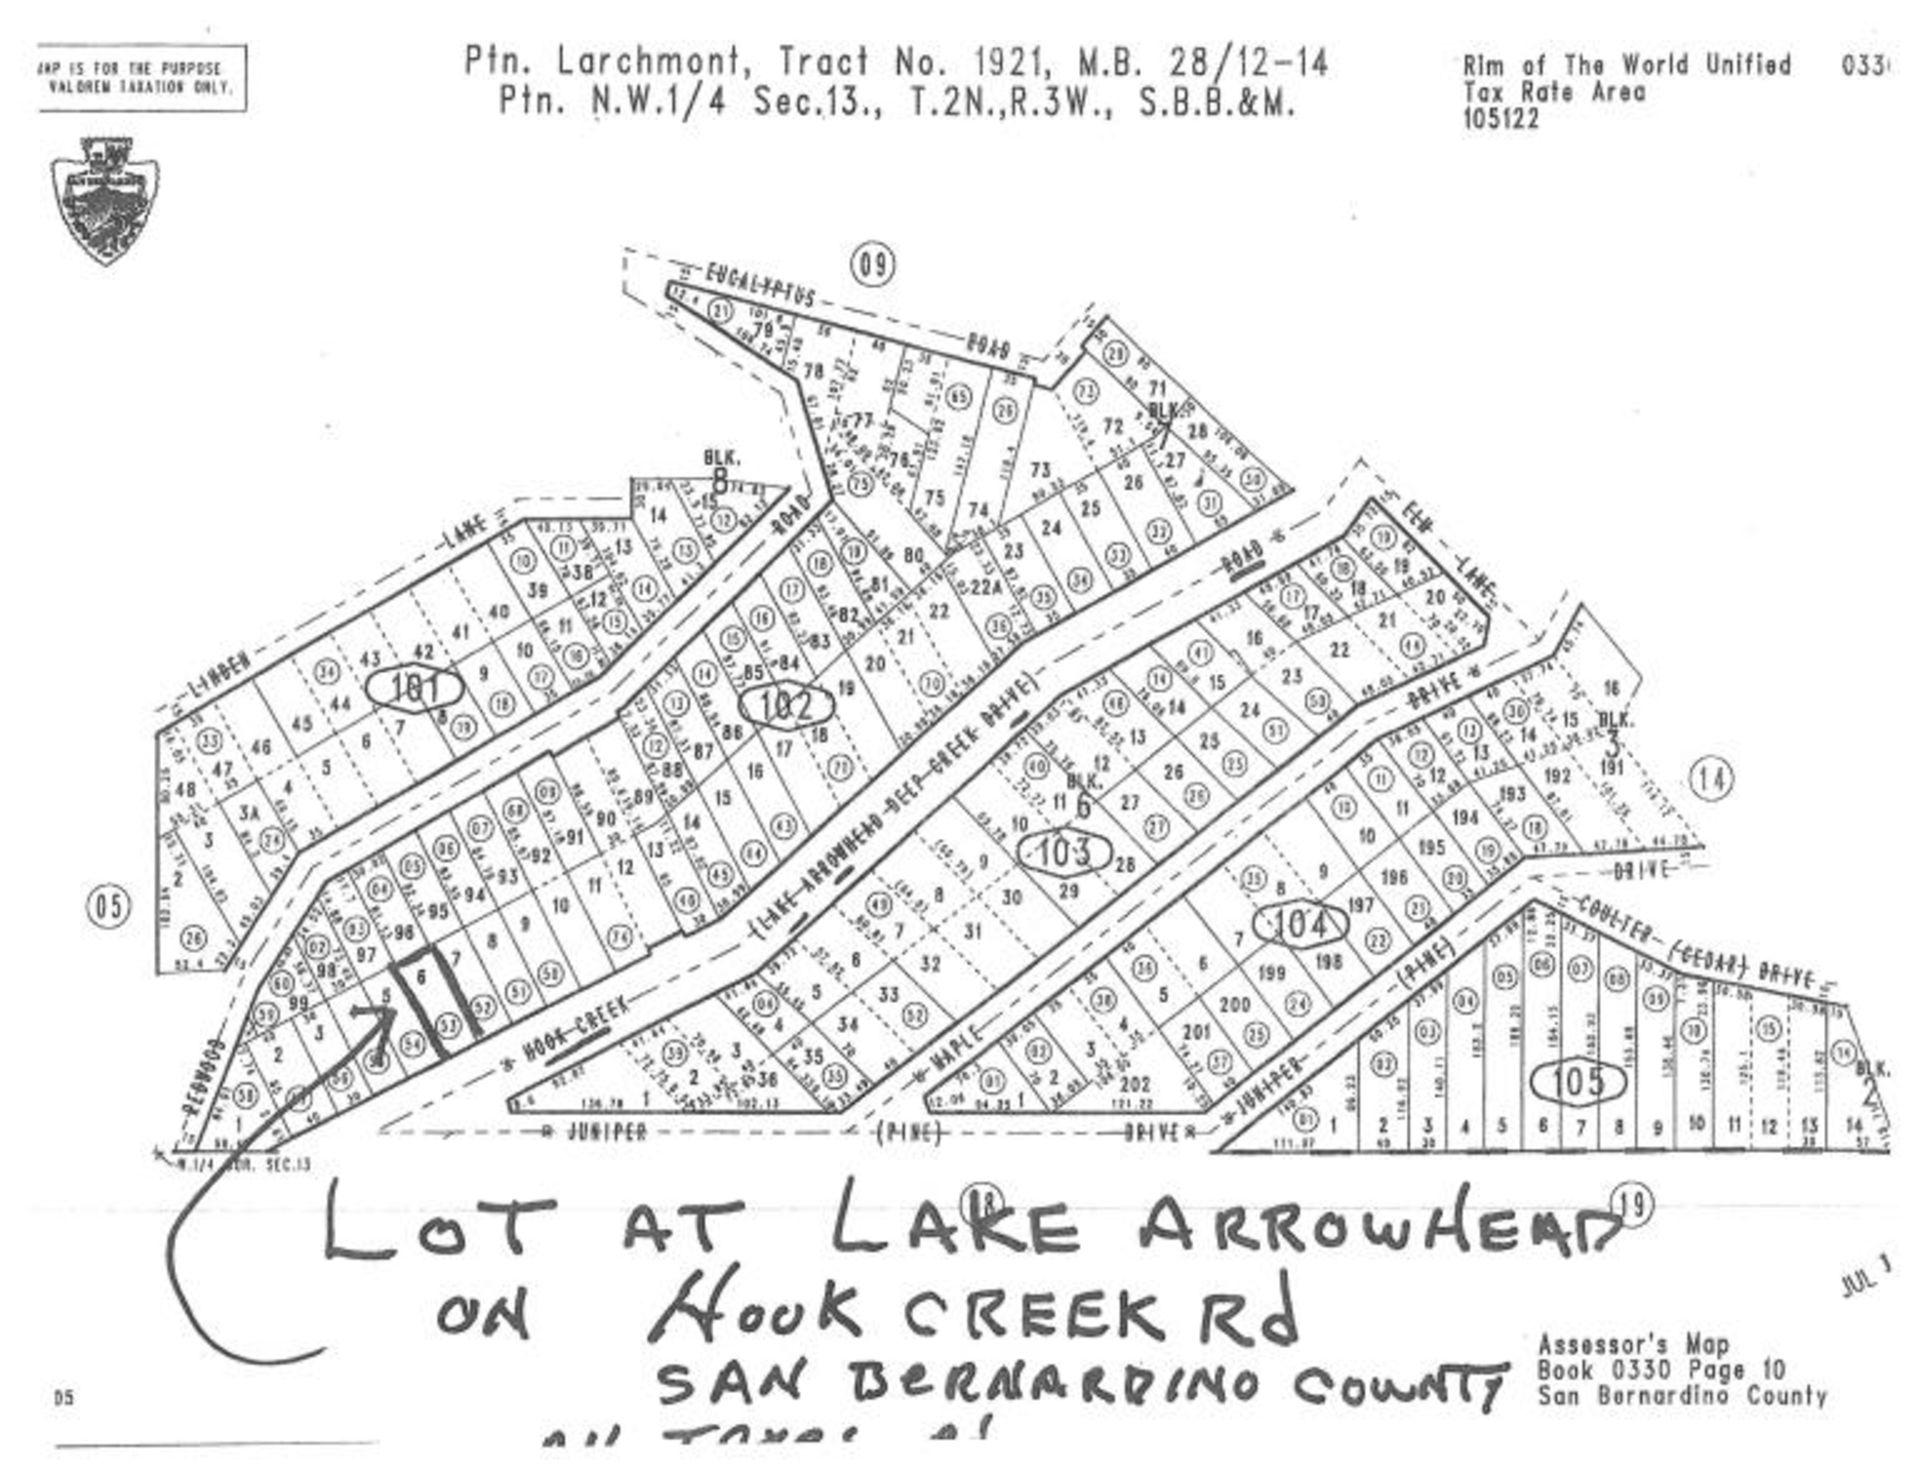 Lot 503 - Vacant Parcel Near the Lake Arrowhead,